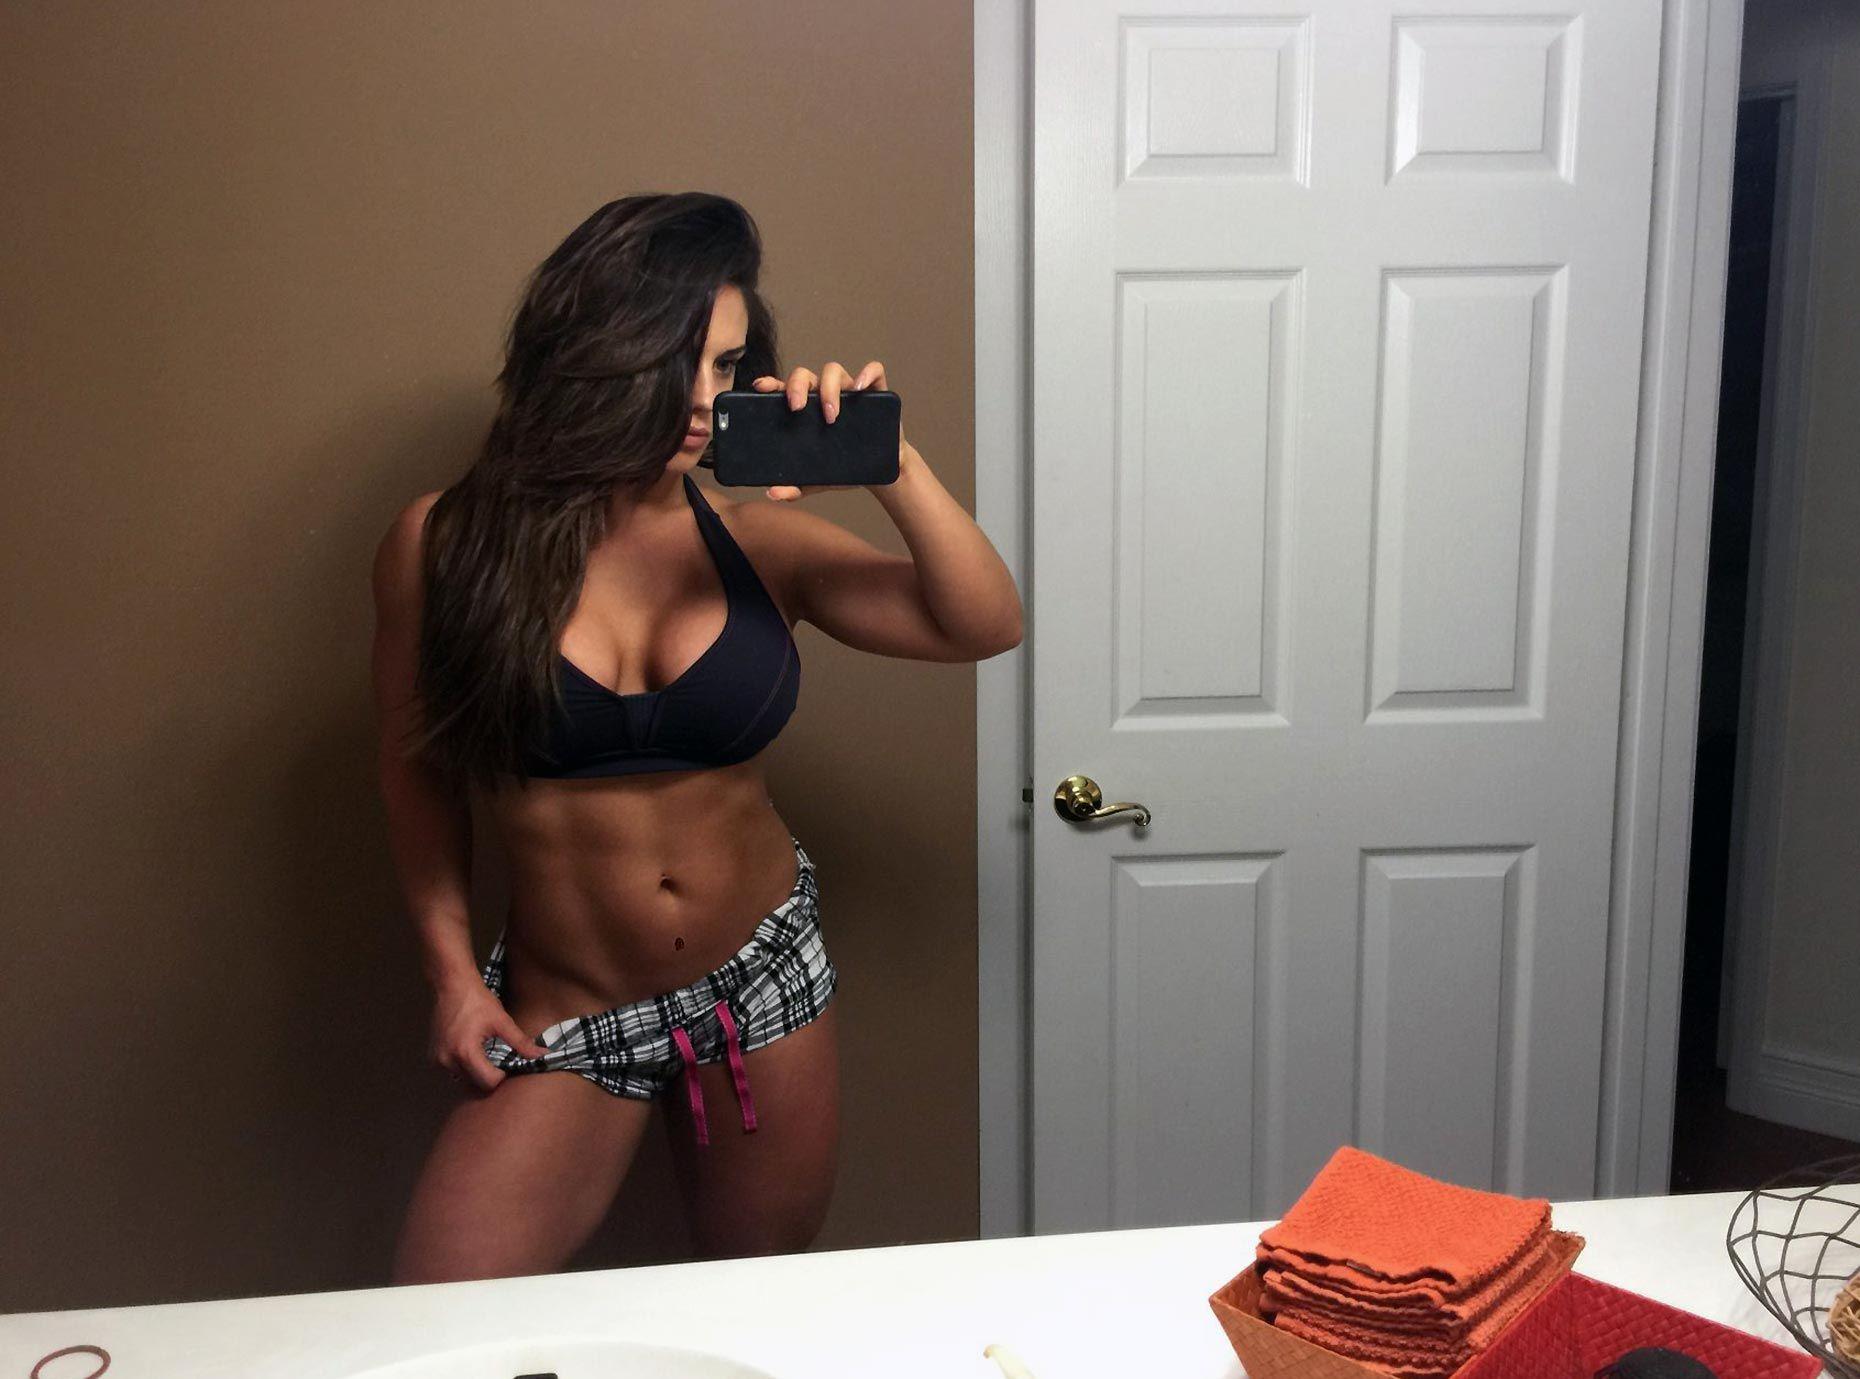 Celeste Bonin Nude Leaked The Fappening & Sexy 0119